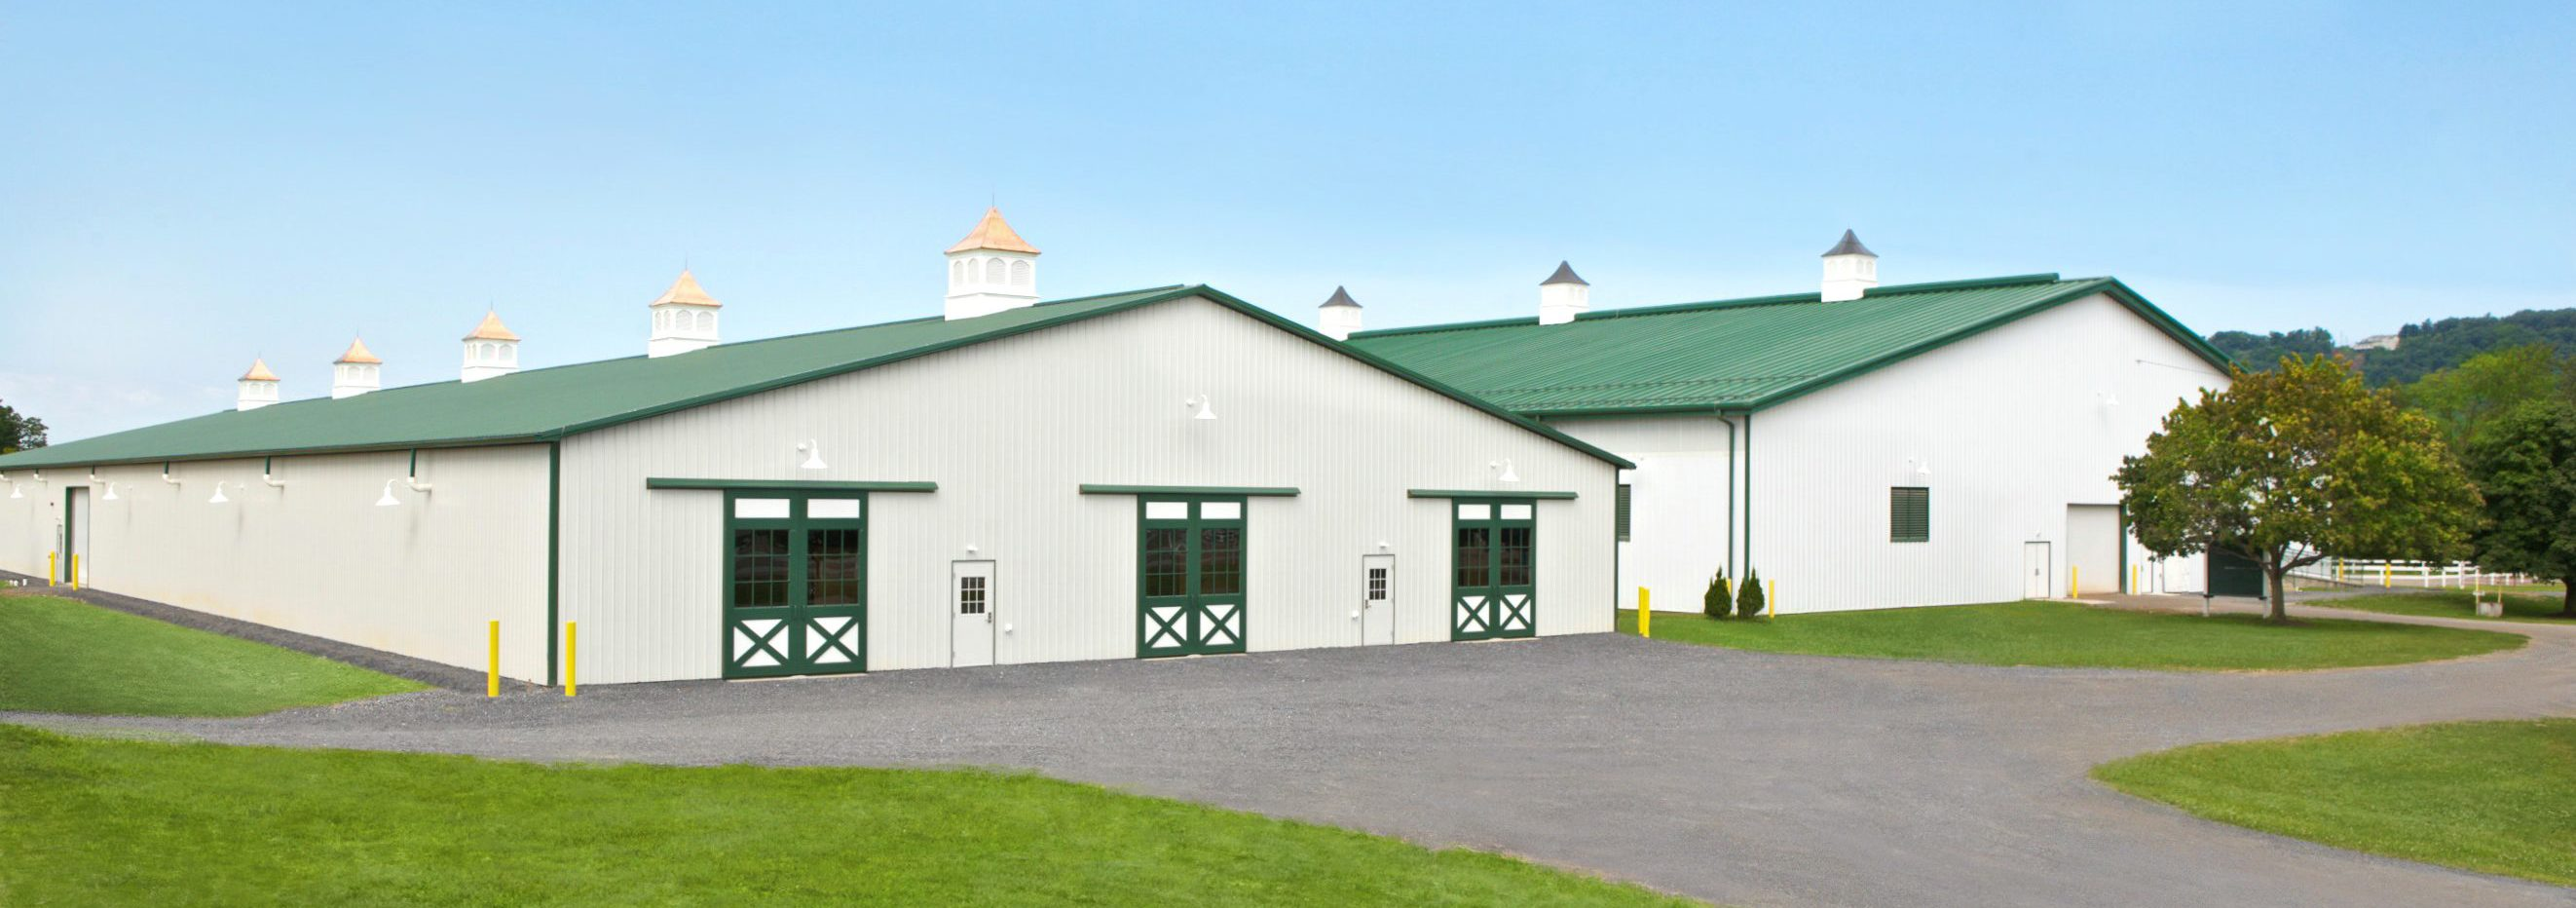 Grange Equine Center